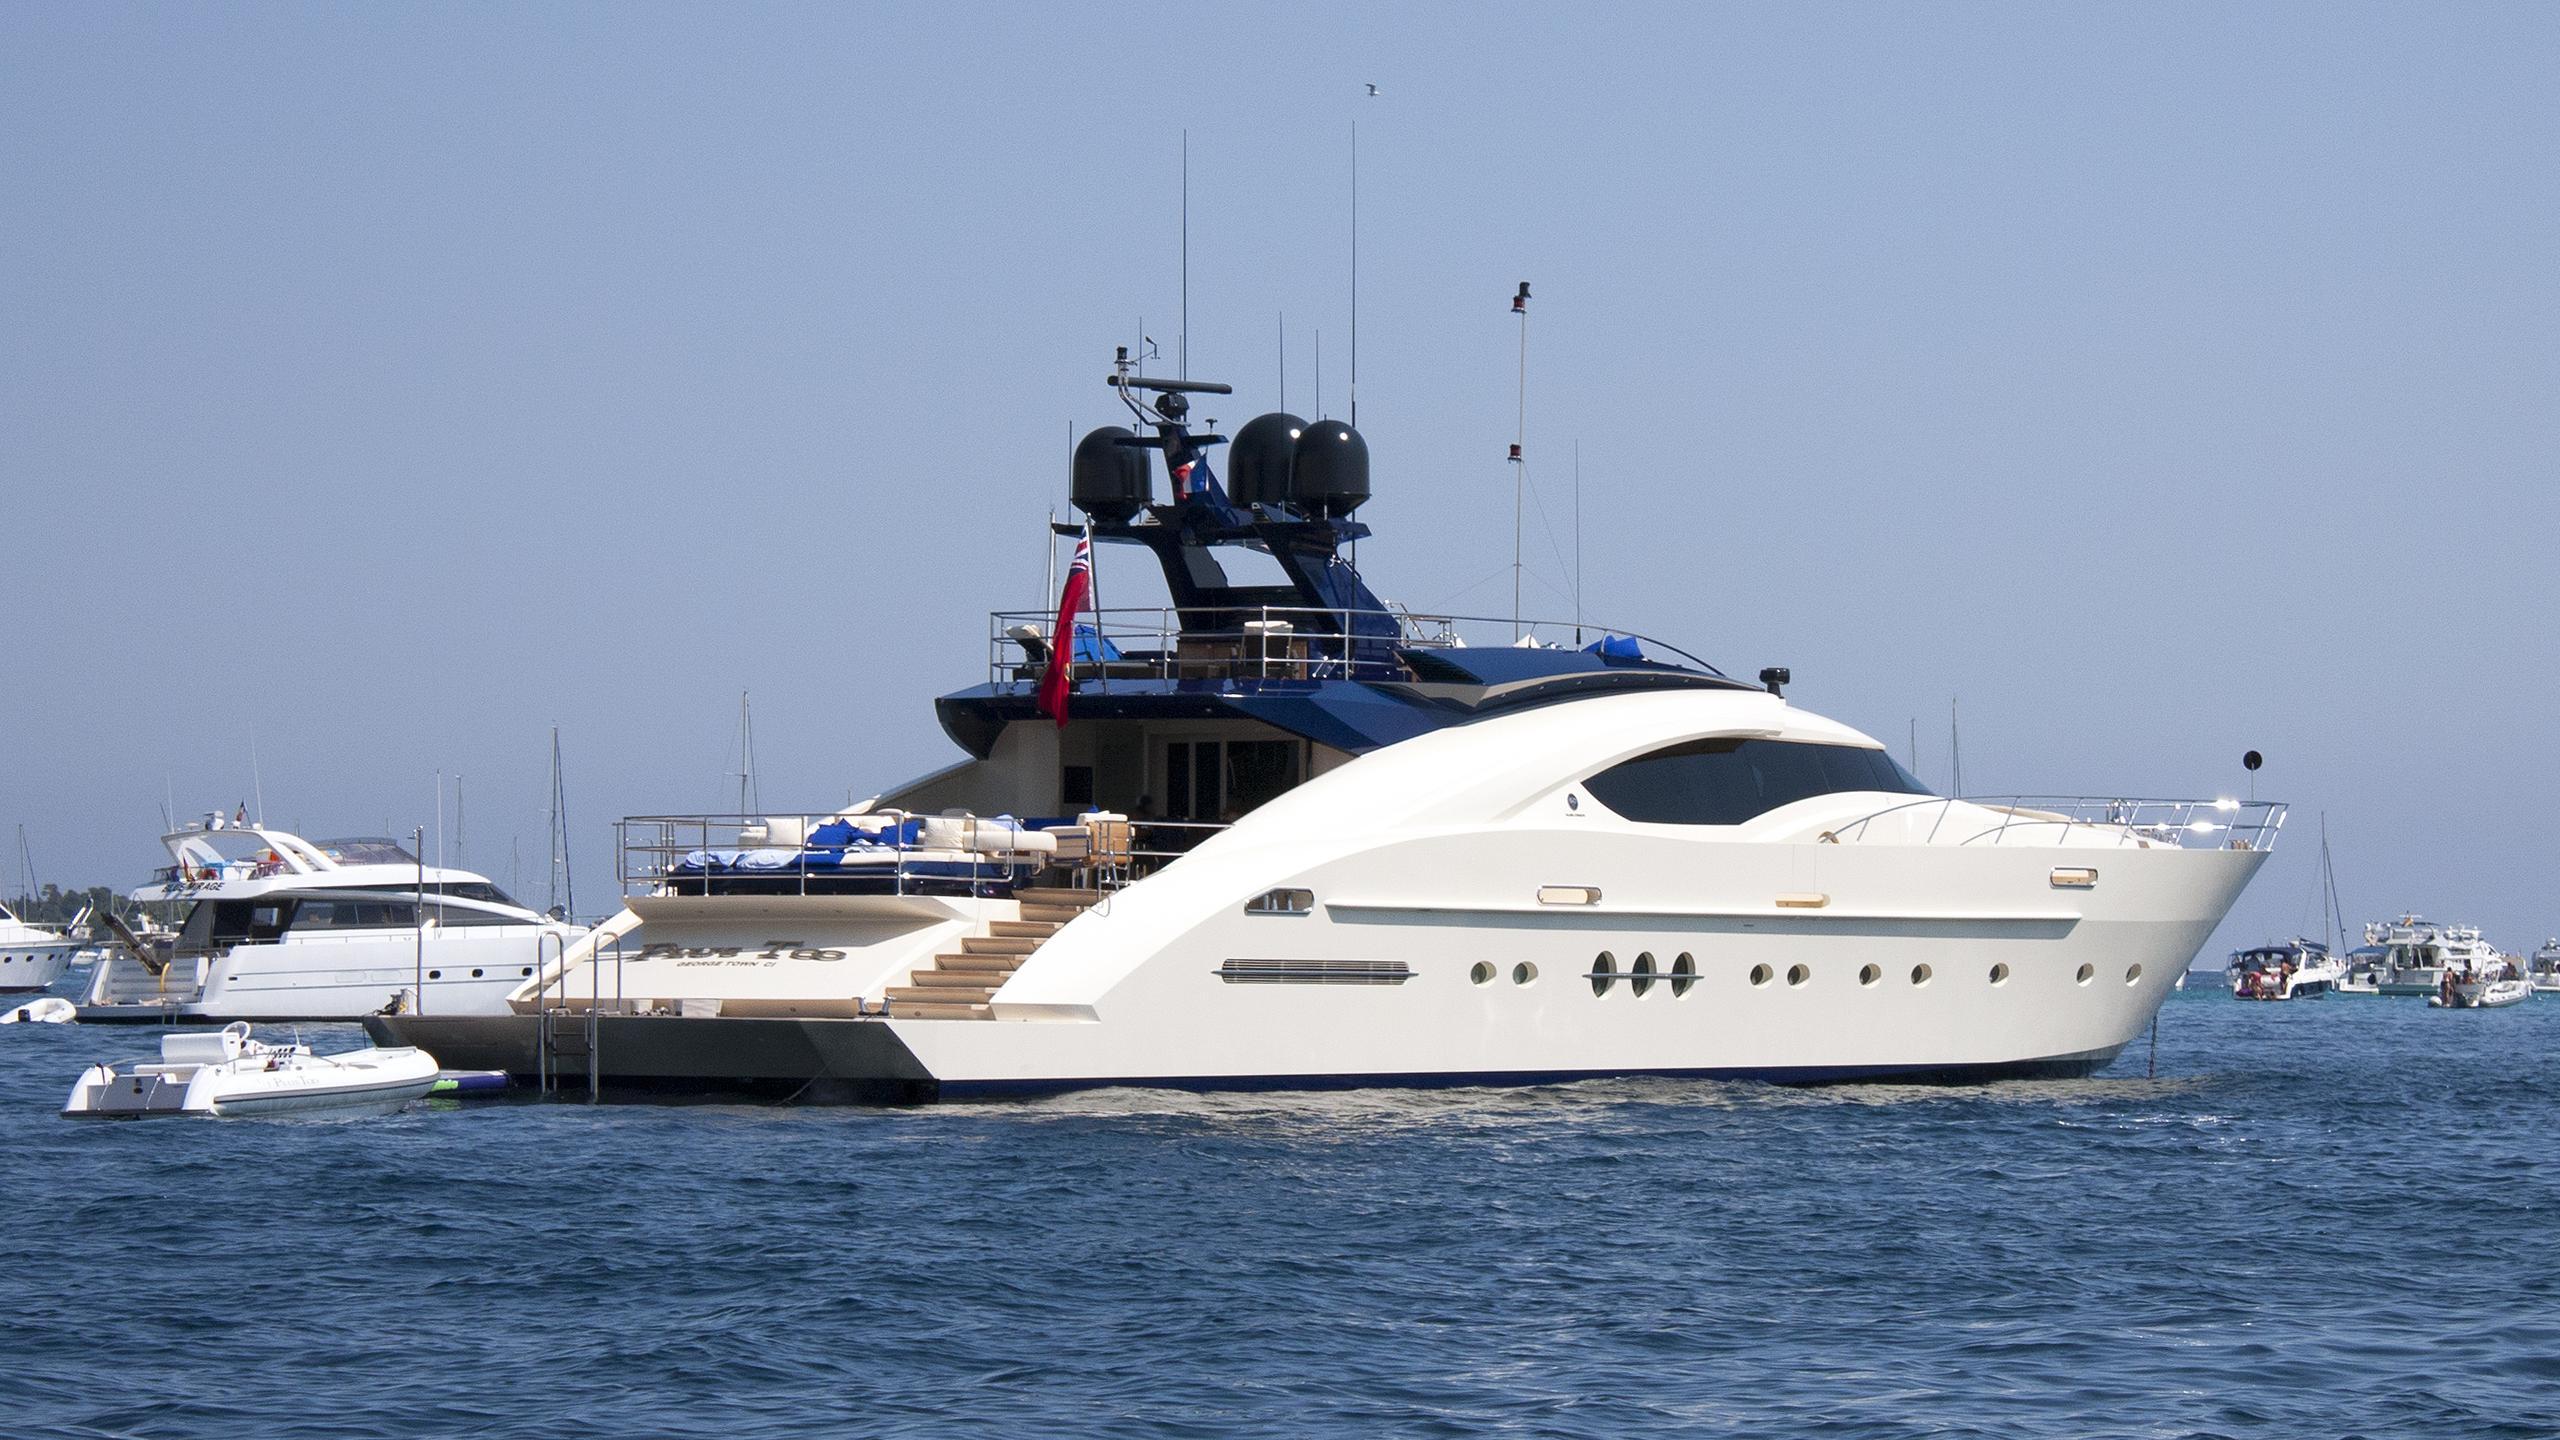 plus-too-motor-yacht-palmer-johnson-135-my-2008-41m-stern